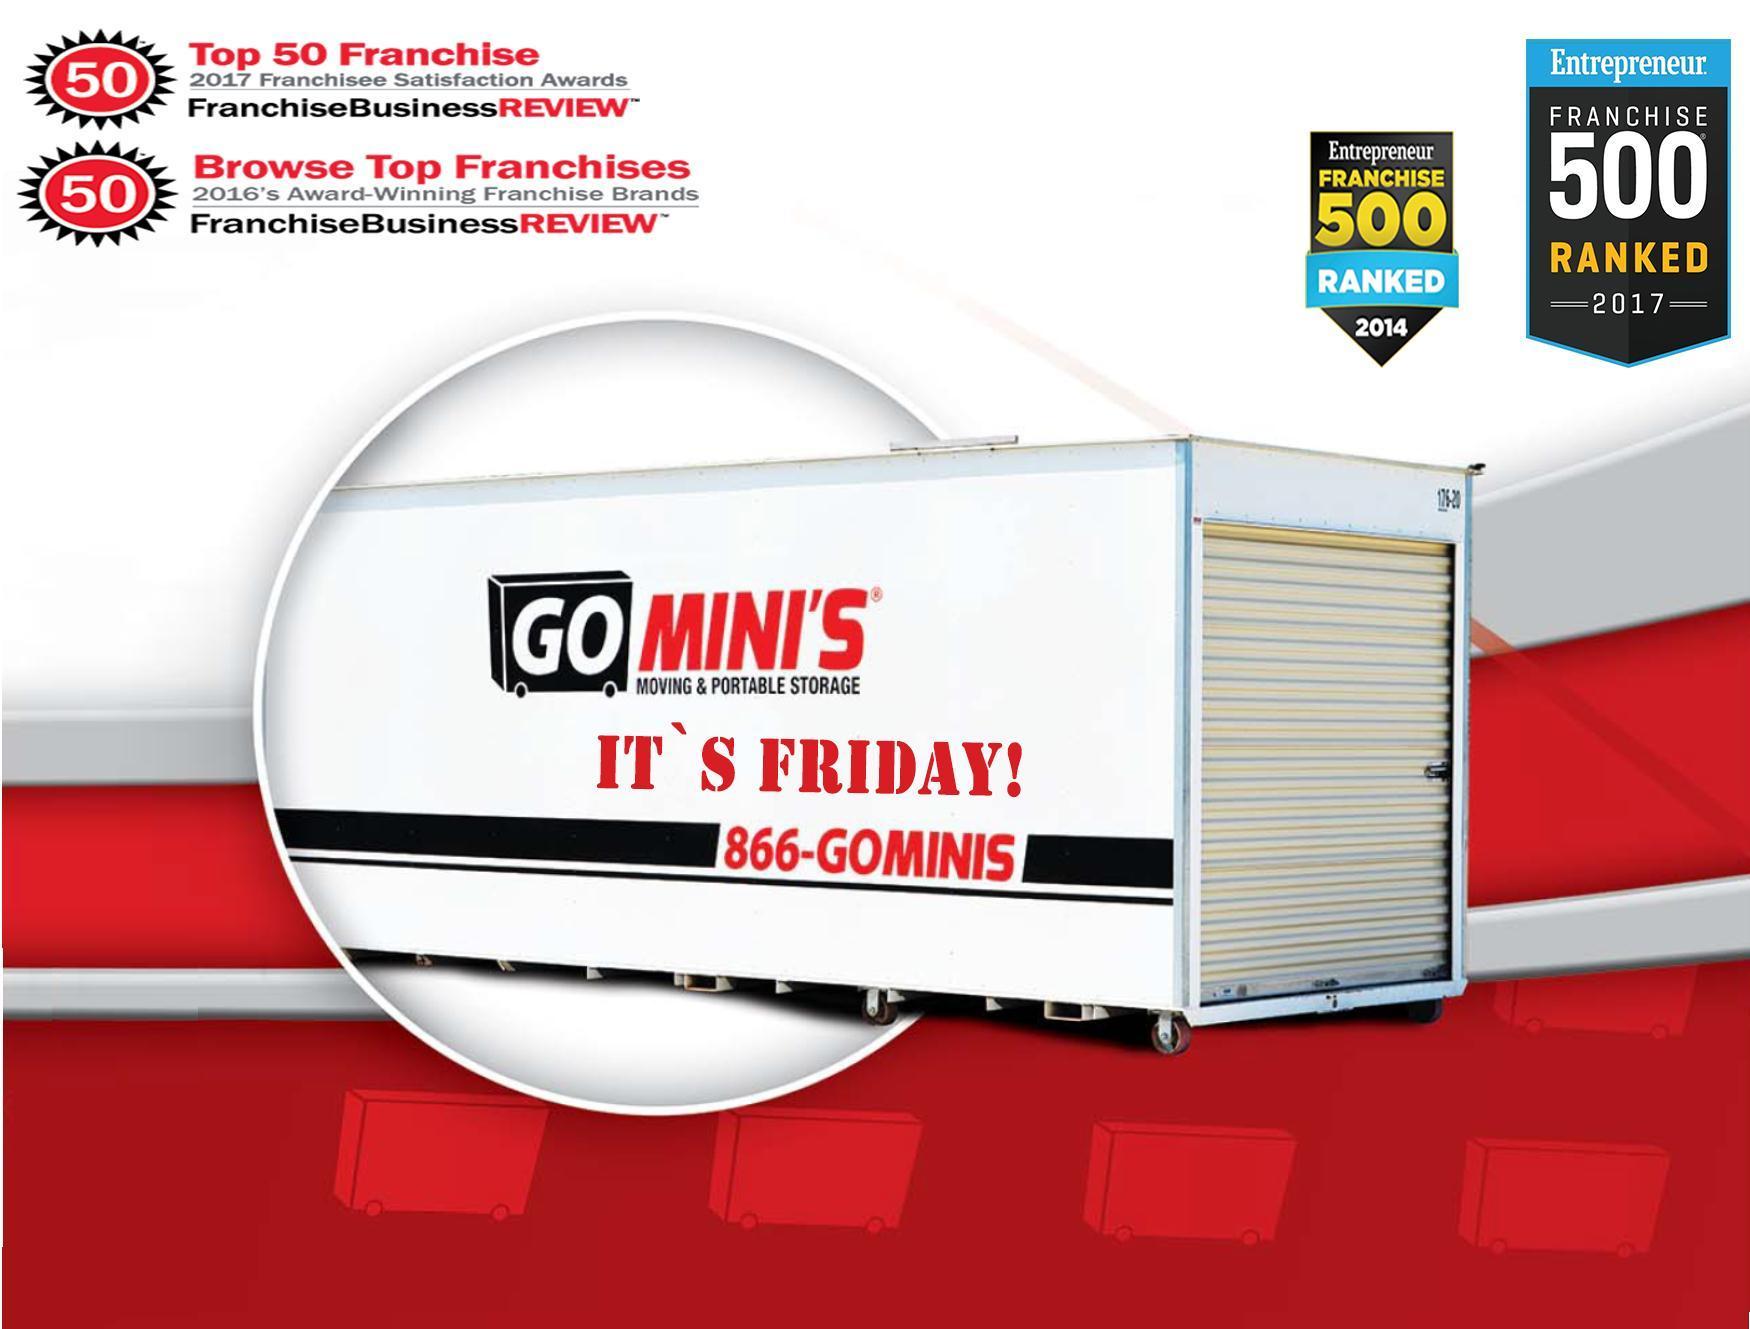 Go Mini's Moving & Portable Storage image 40